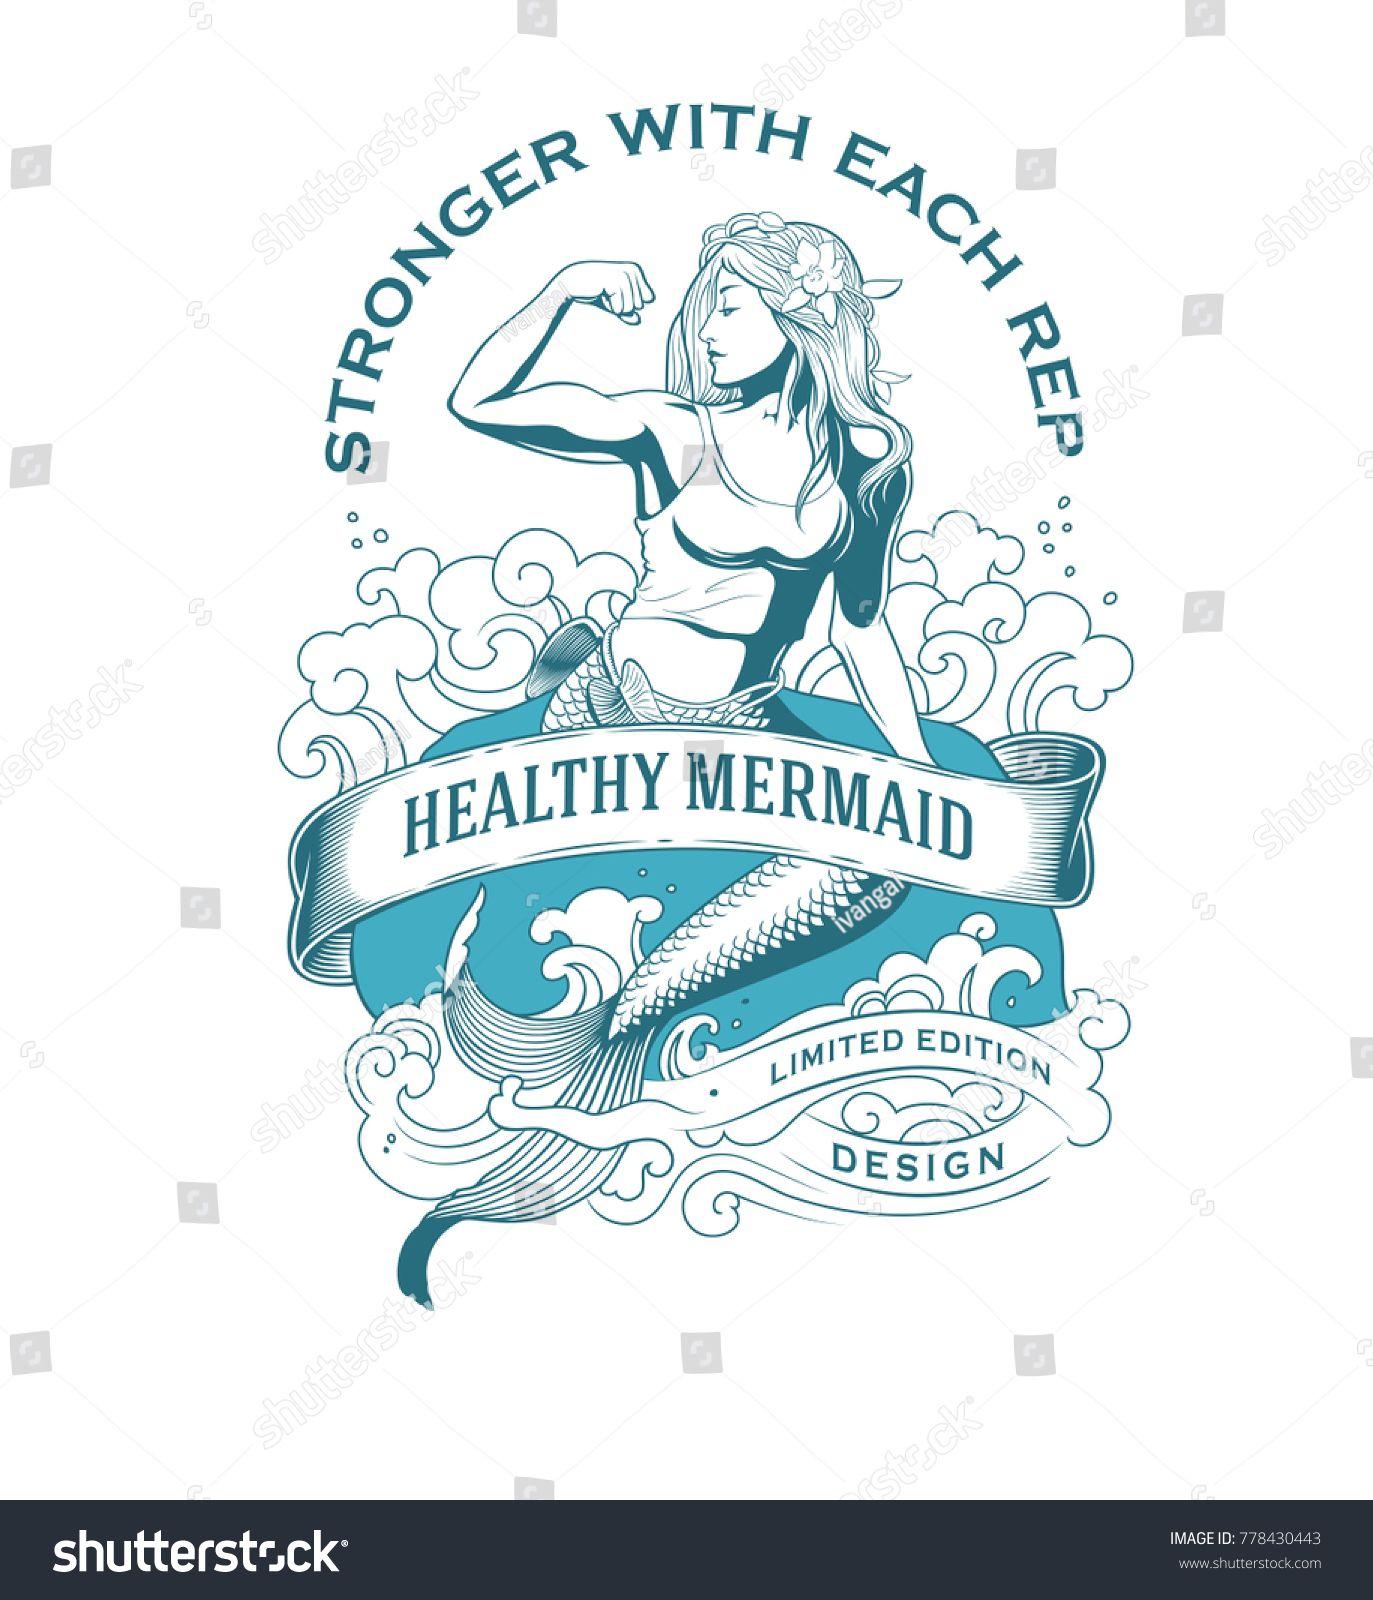 Healthy Mermaid Fitness Emblem #Sponsored , #spon, #Mermaid#Healthy#Emblem#Fitness